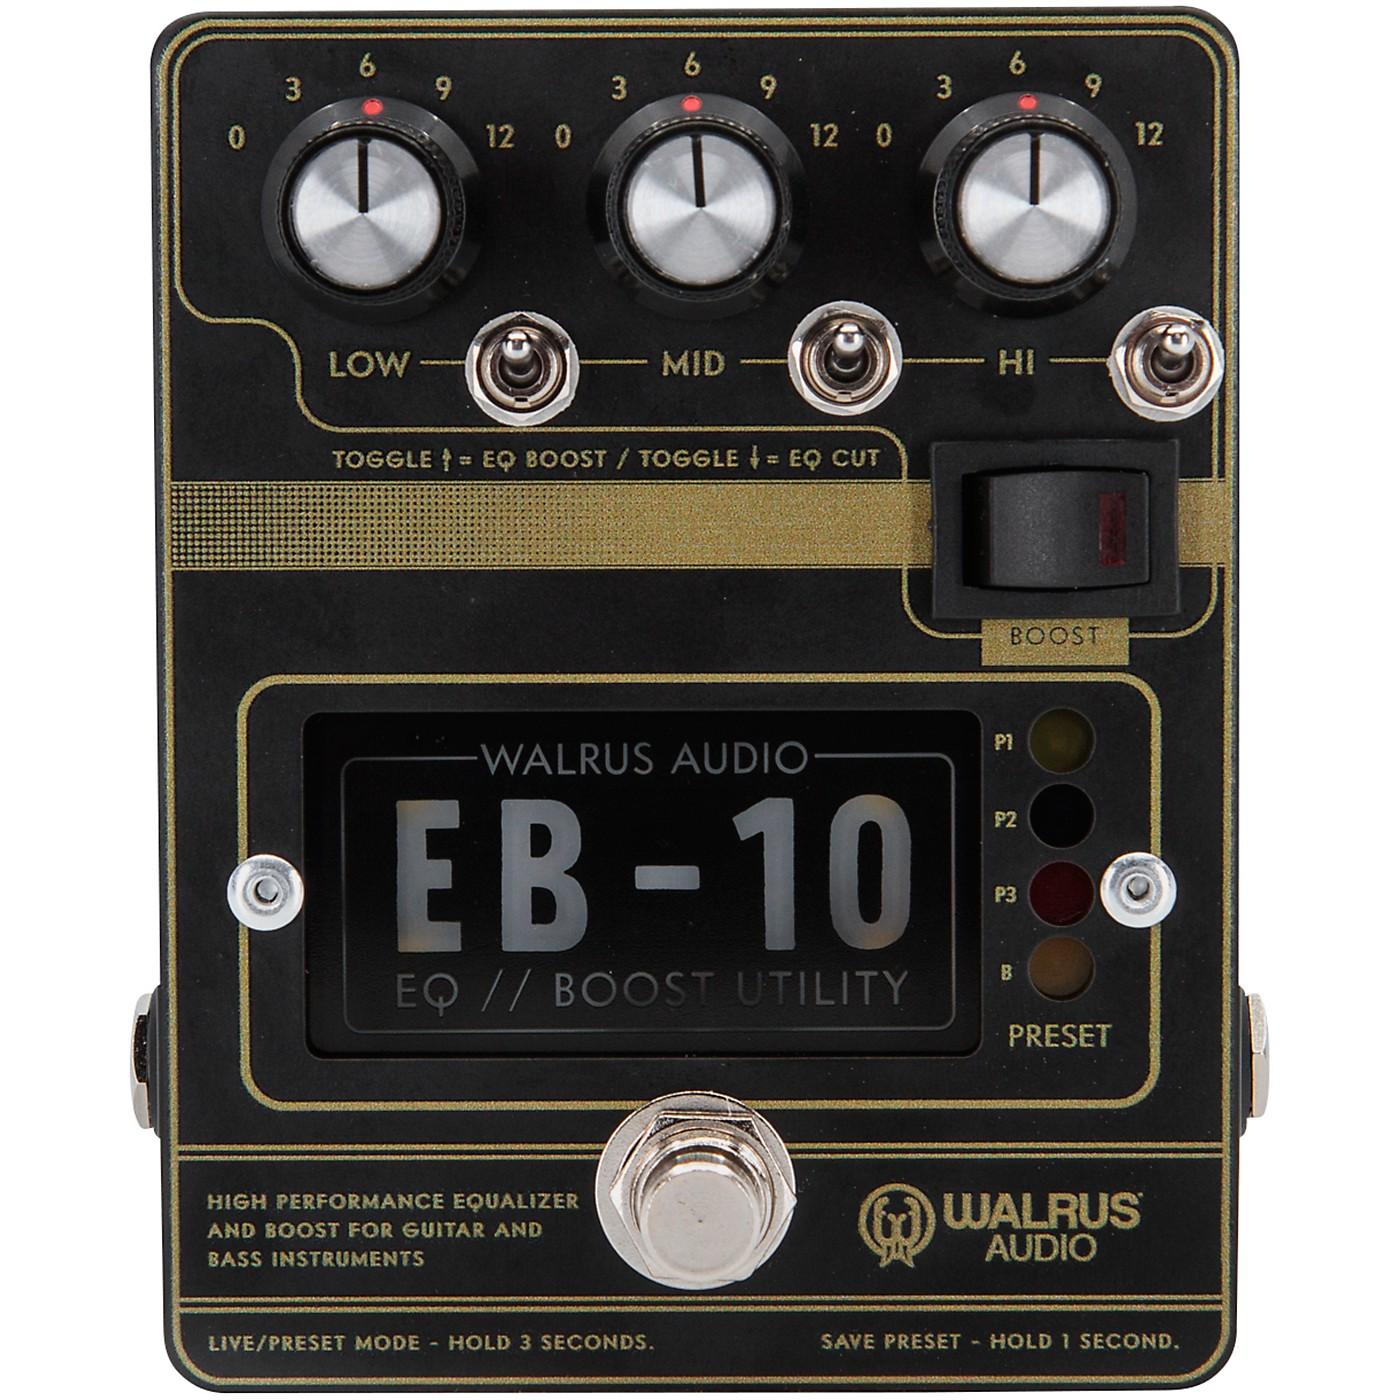 Walrus Audio EB-10 Preamp/EQ/Boost Effects Pedal thumbnail